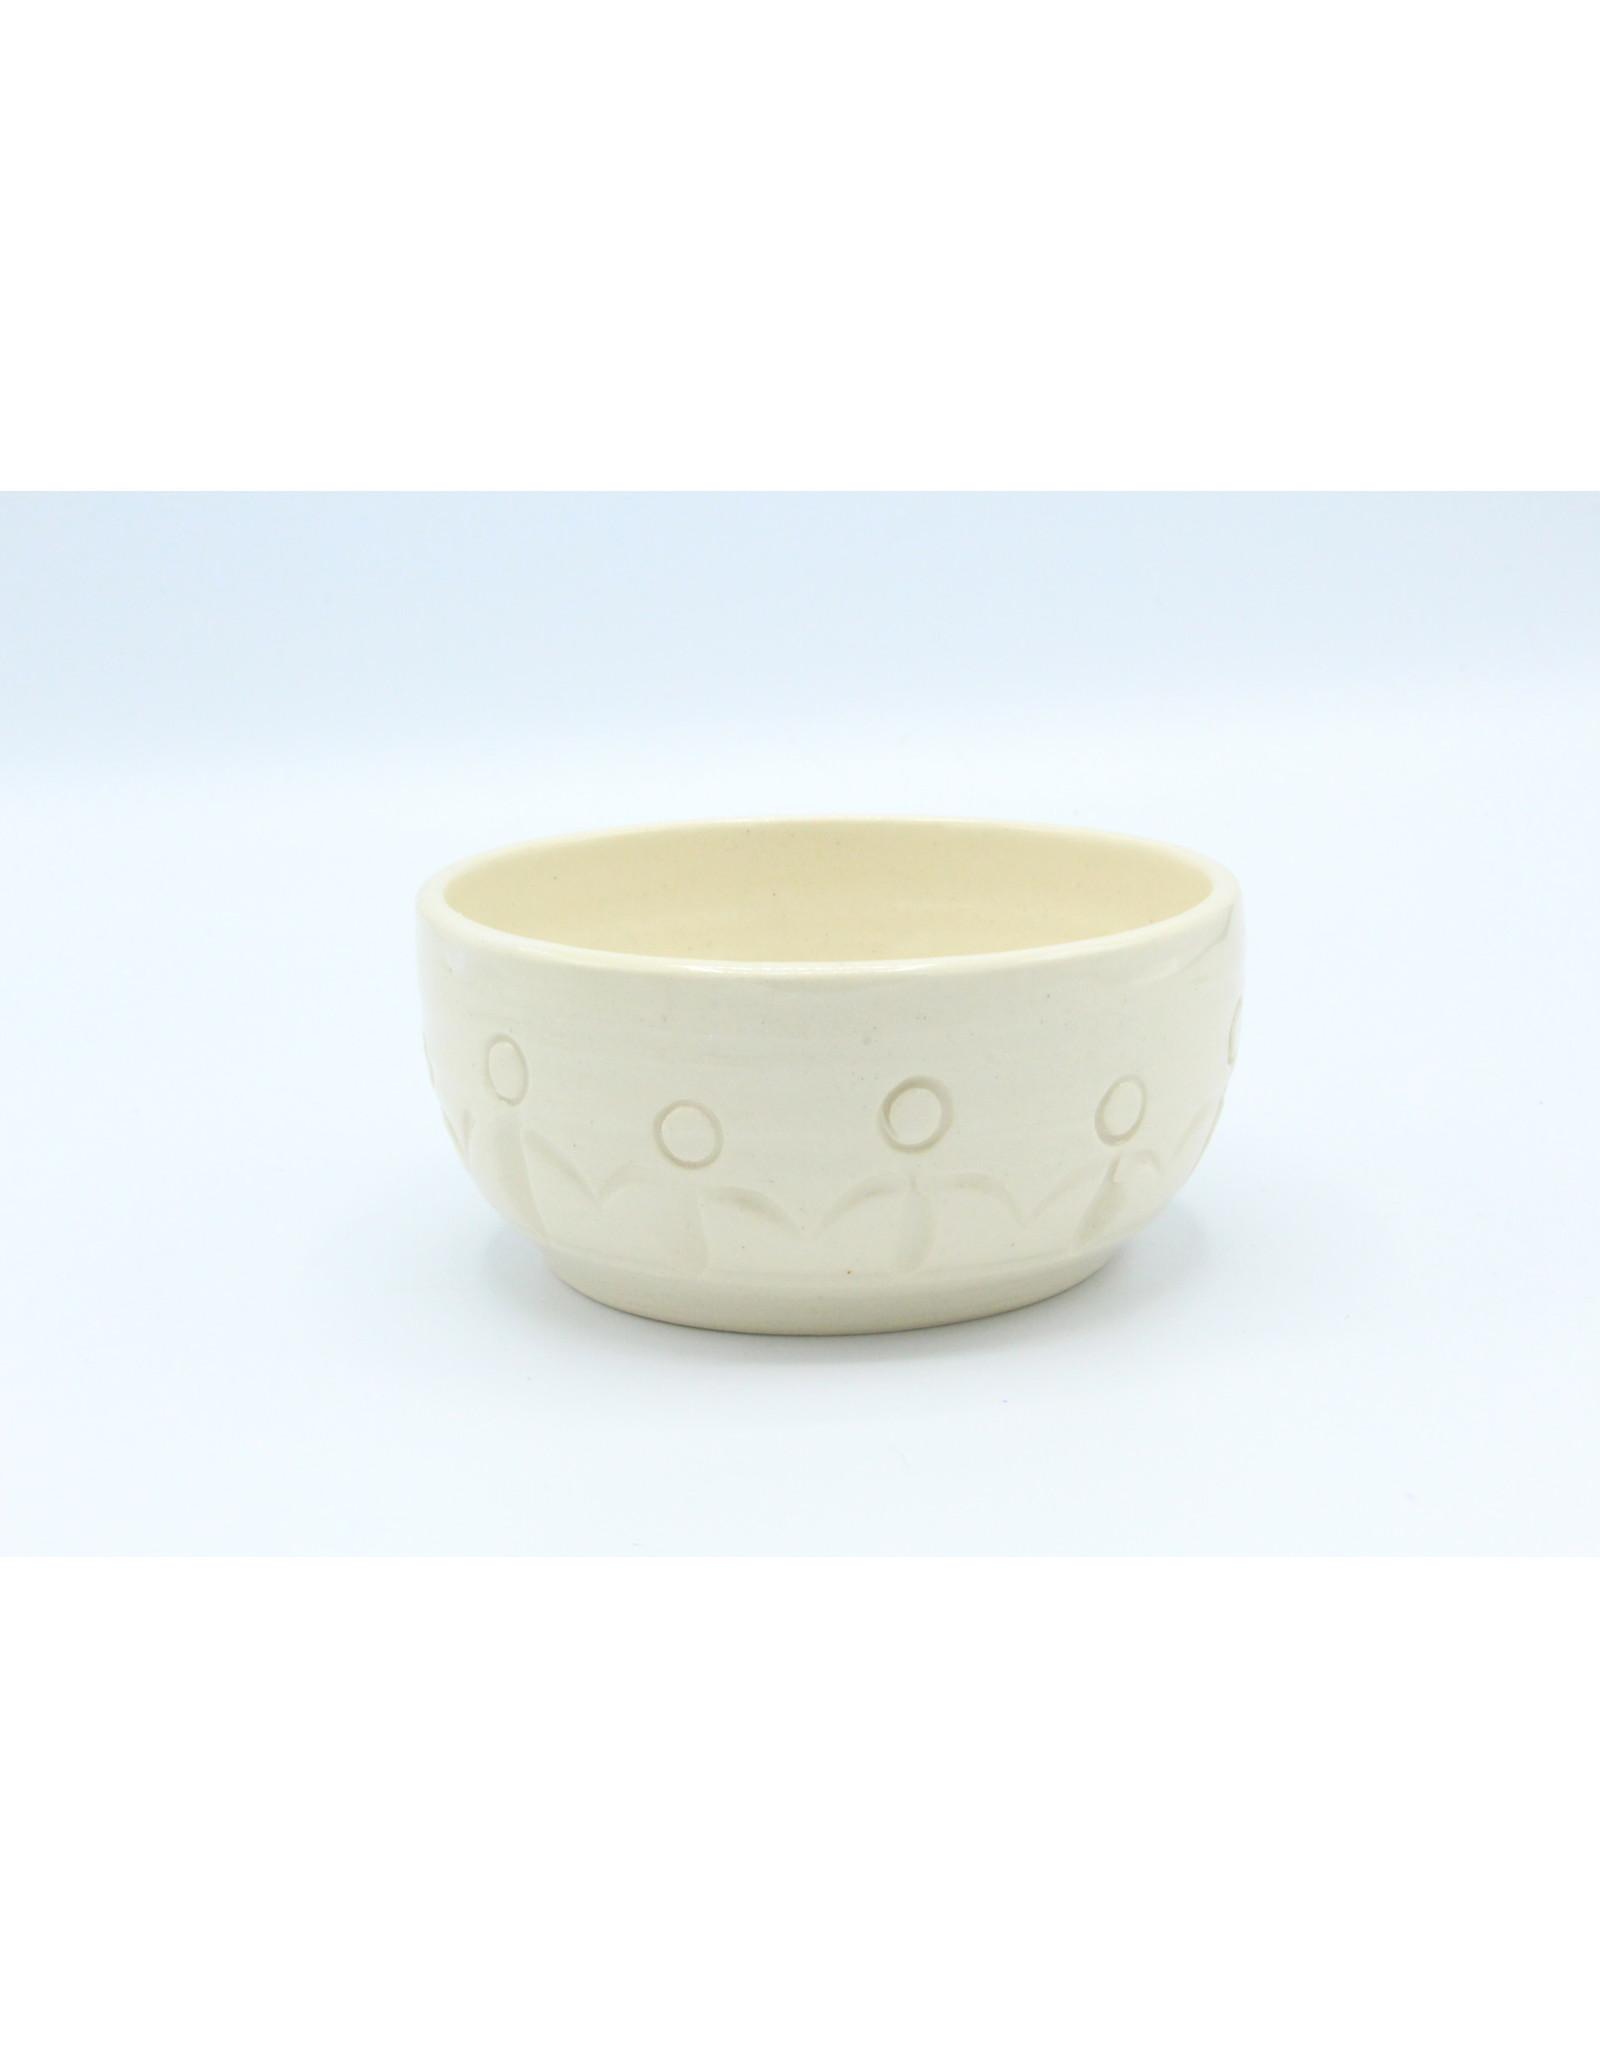 Small Friendship Bowls